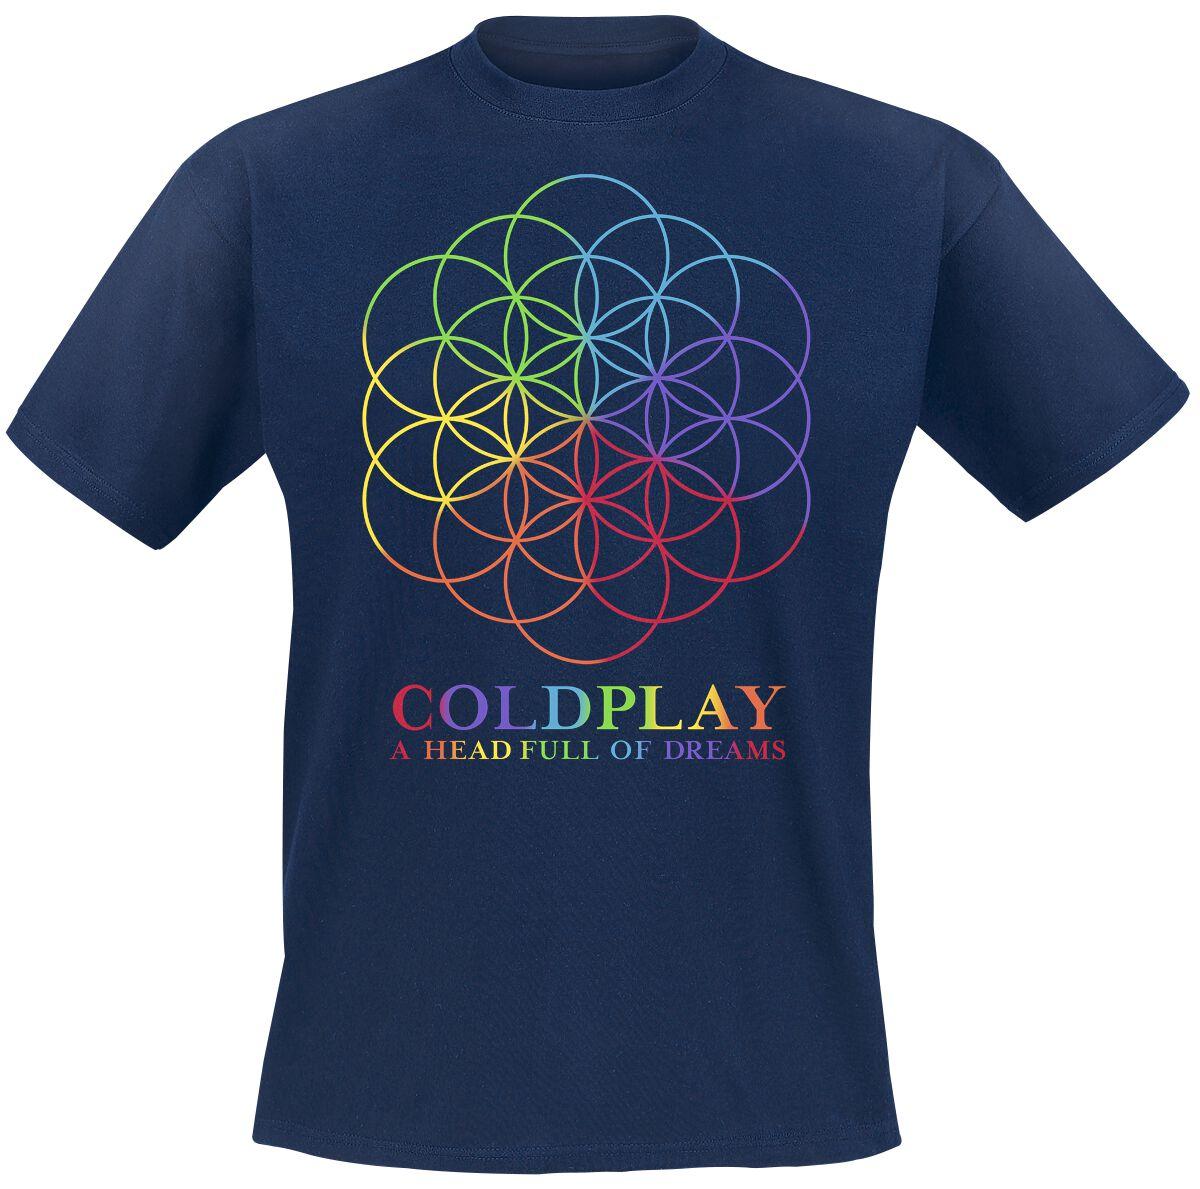 Zespoły - Koszulki - T-Shirt Coldplay A Head Full Of Dreams T-Shirt granatowy - 364486